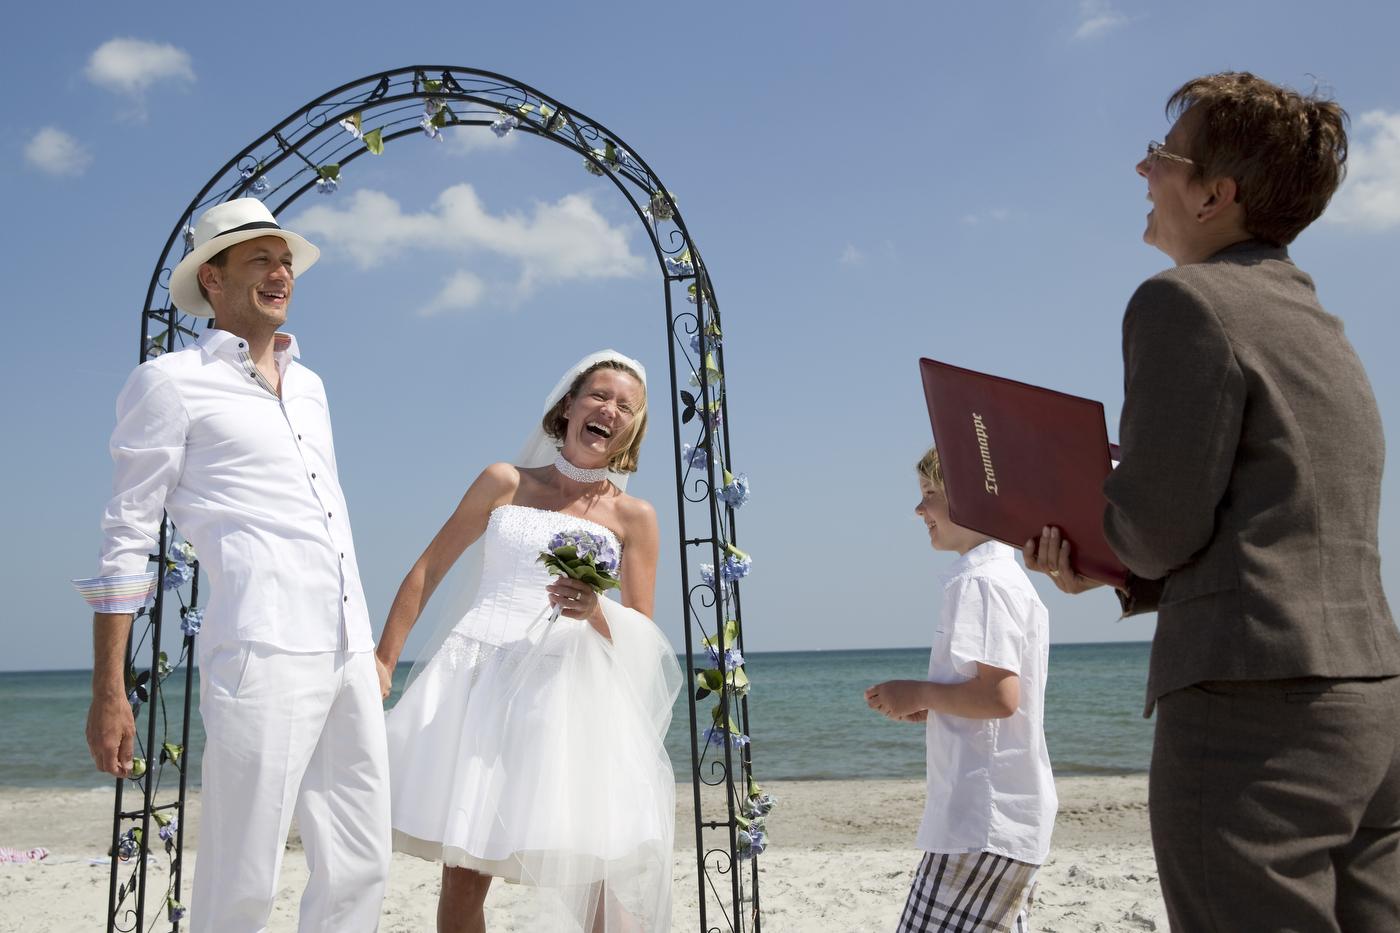 Myrelle Couture Marina Deynega Hochzeit Brautmode Kunden5 03